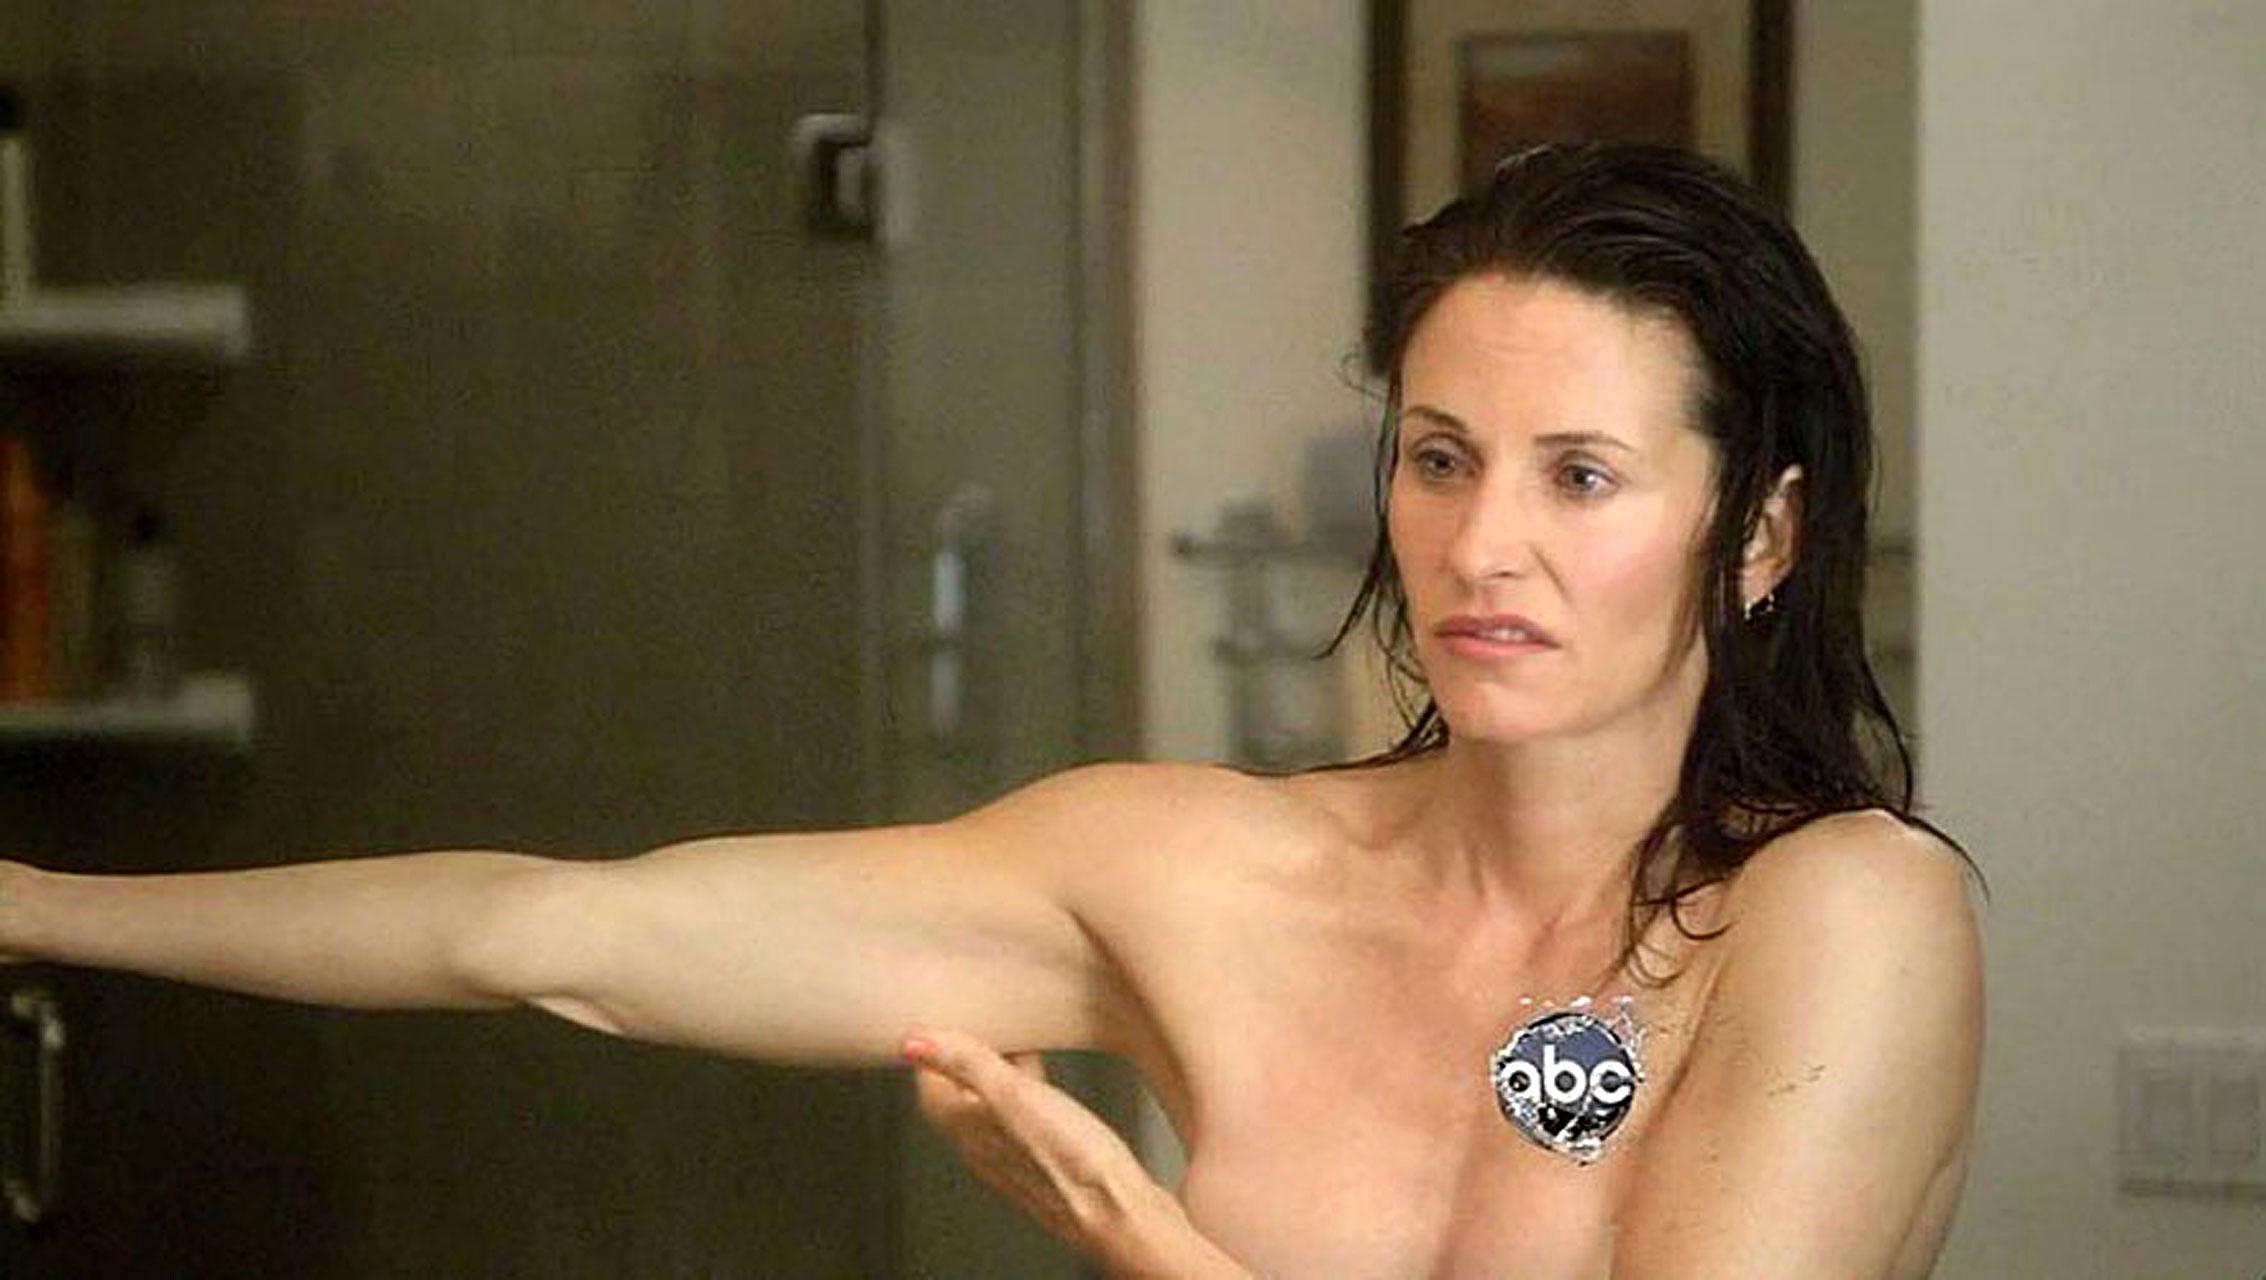 Nude mature wife self shots